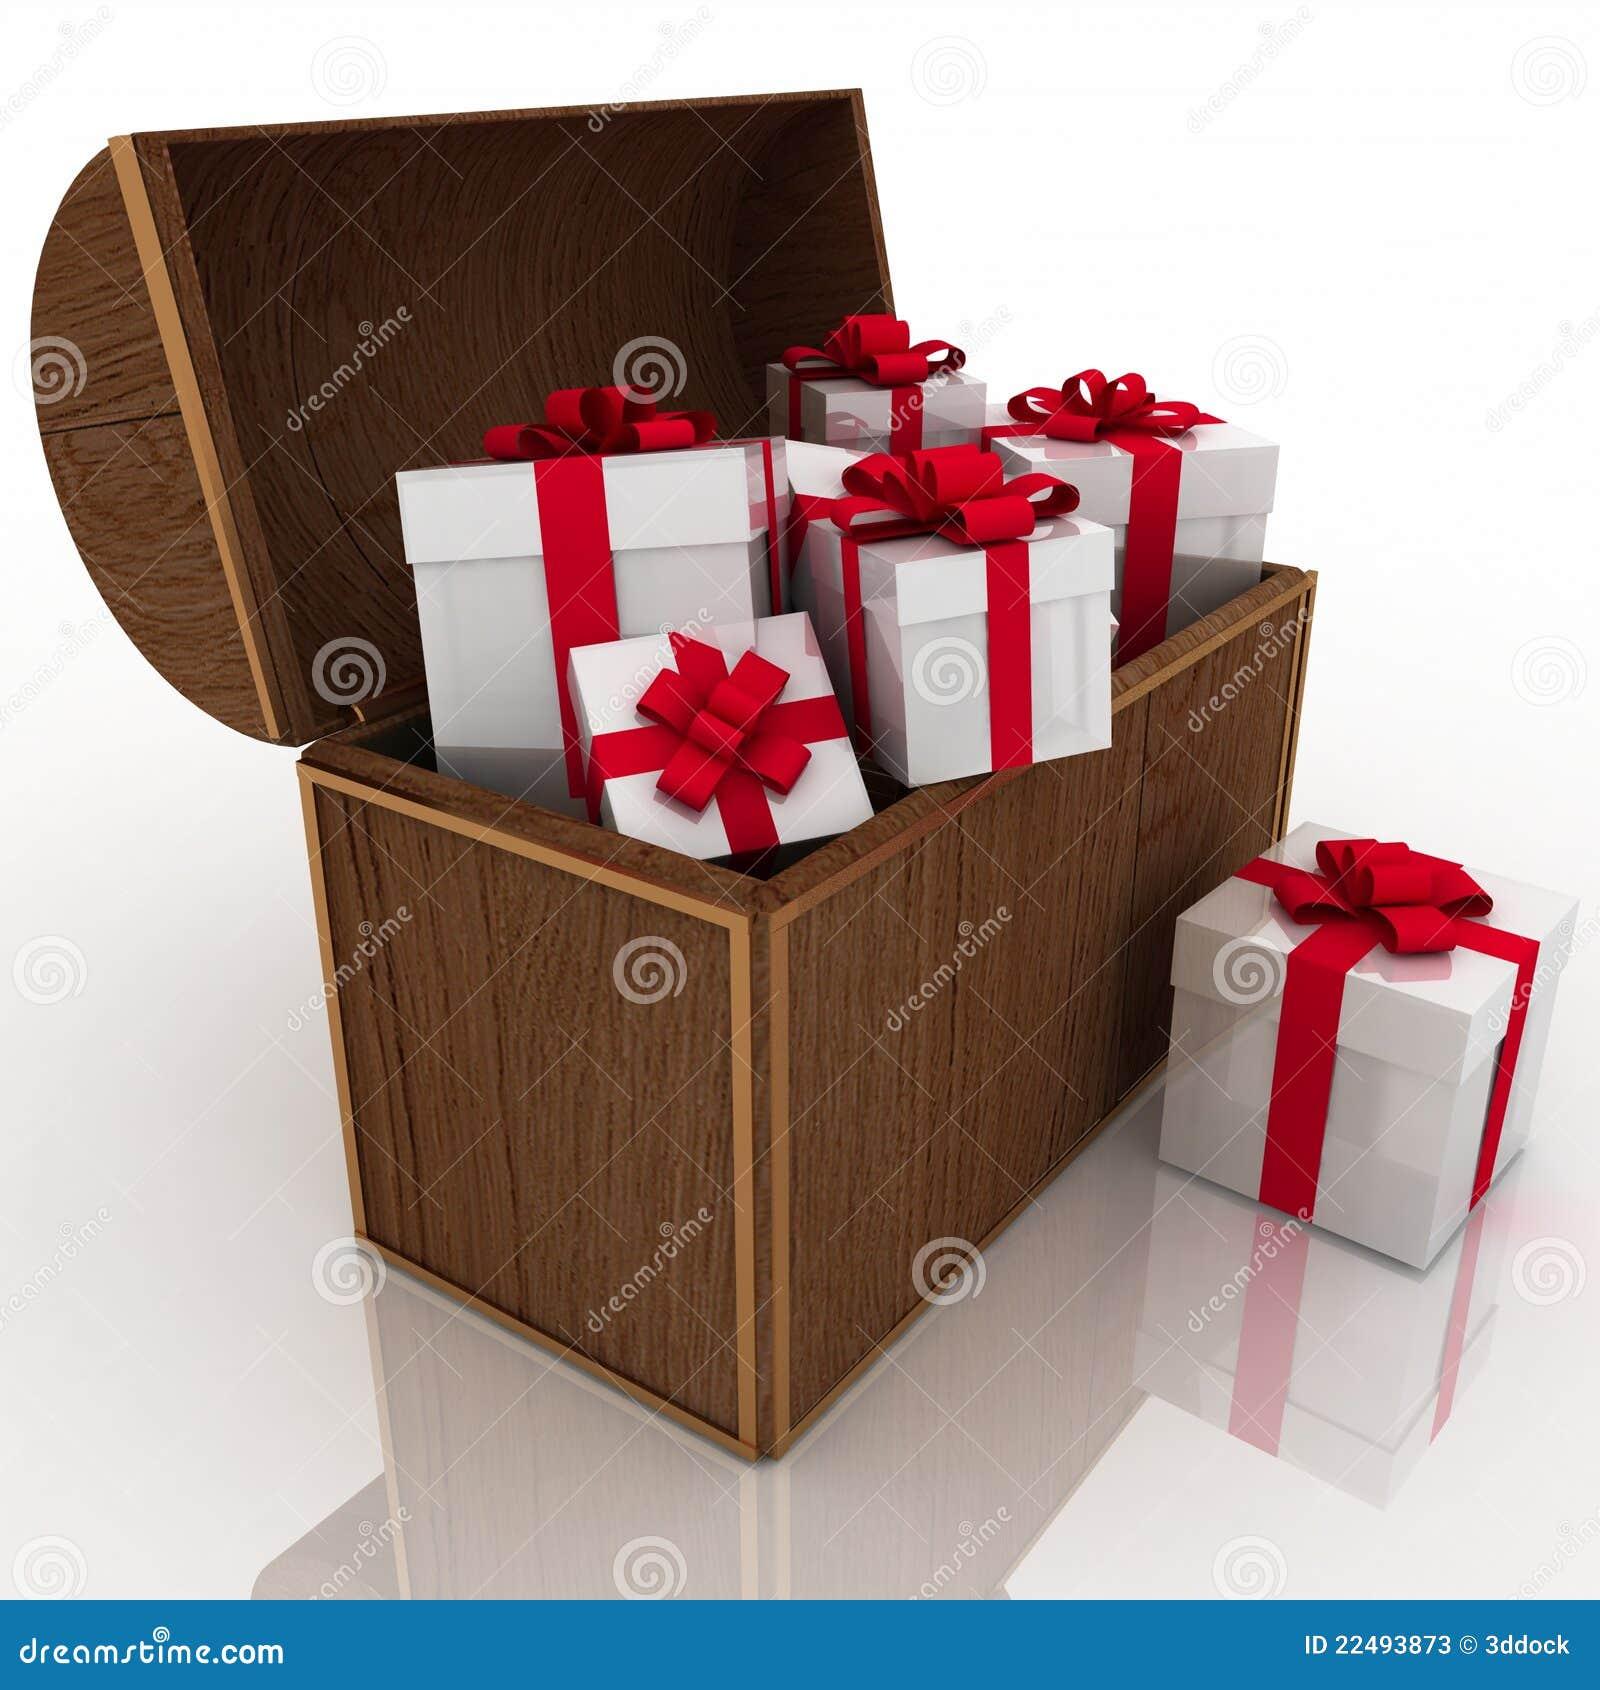 Gifts of Treasure